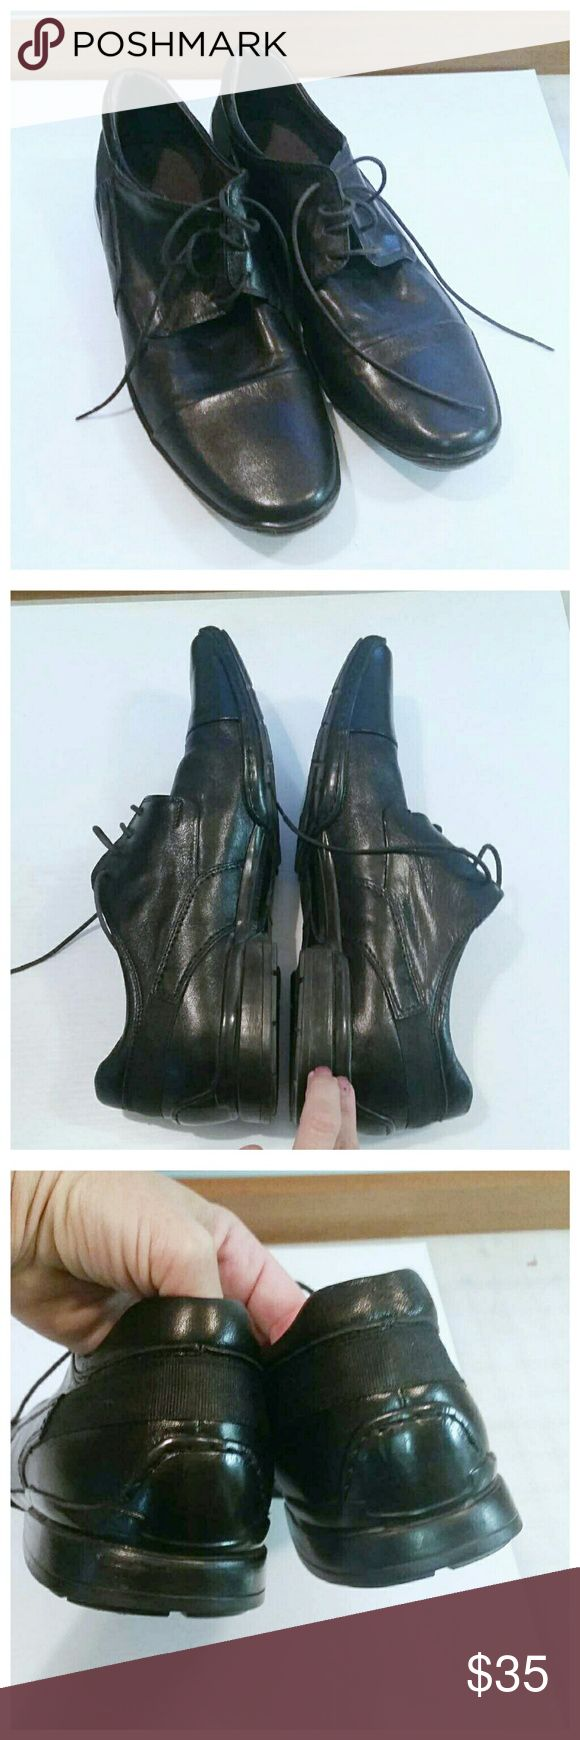 Bacco Bucci black mens dress shoes In excellent condition. Bacco Bucci Shoes Oxfords & Derbys